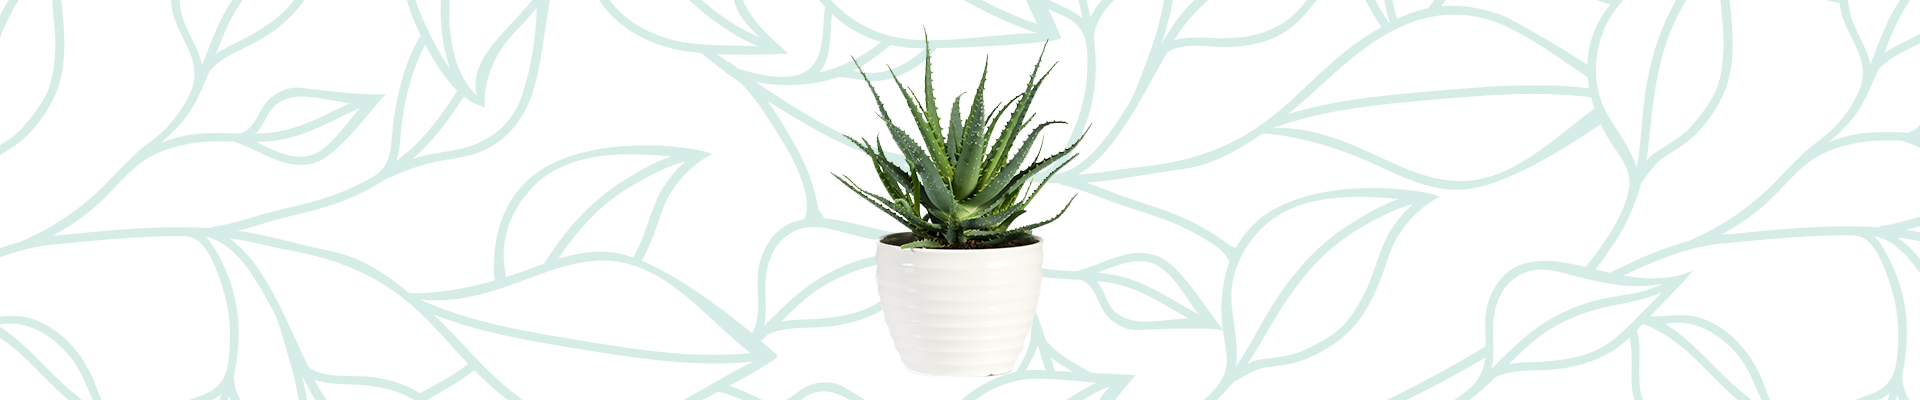 Indoor plants that improve your air quality: Aloe Vera